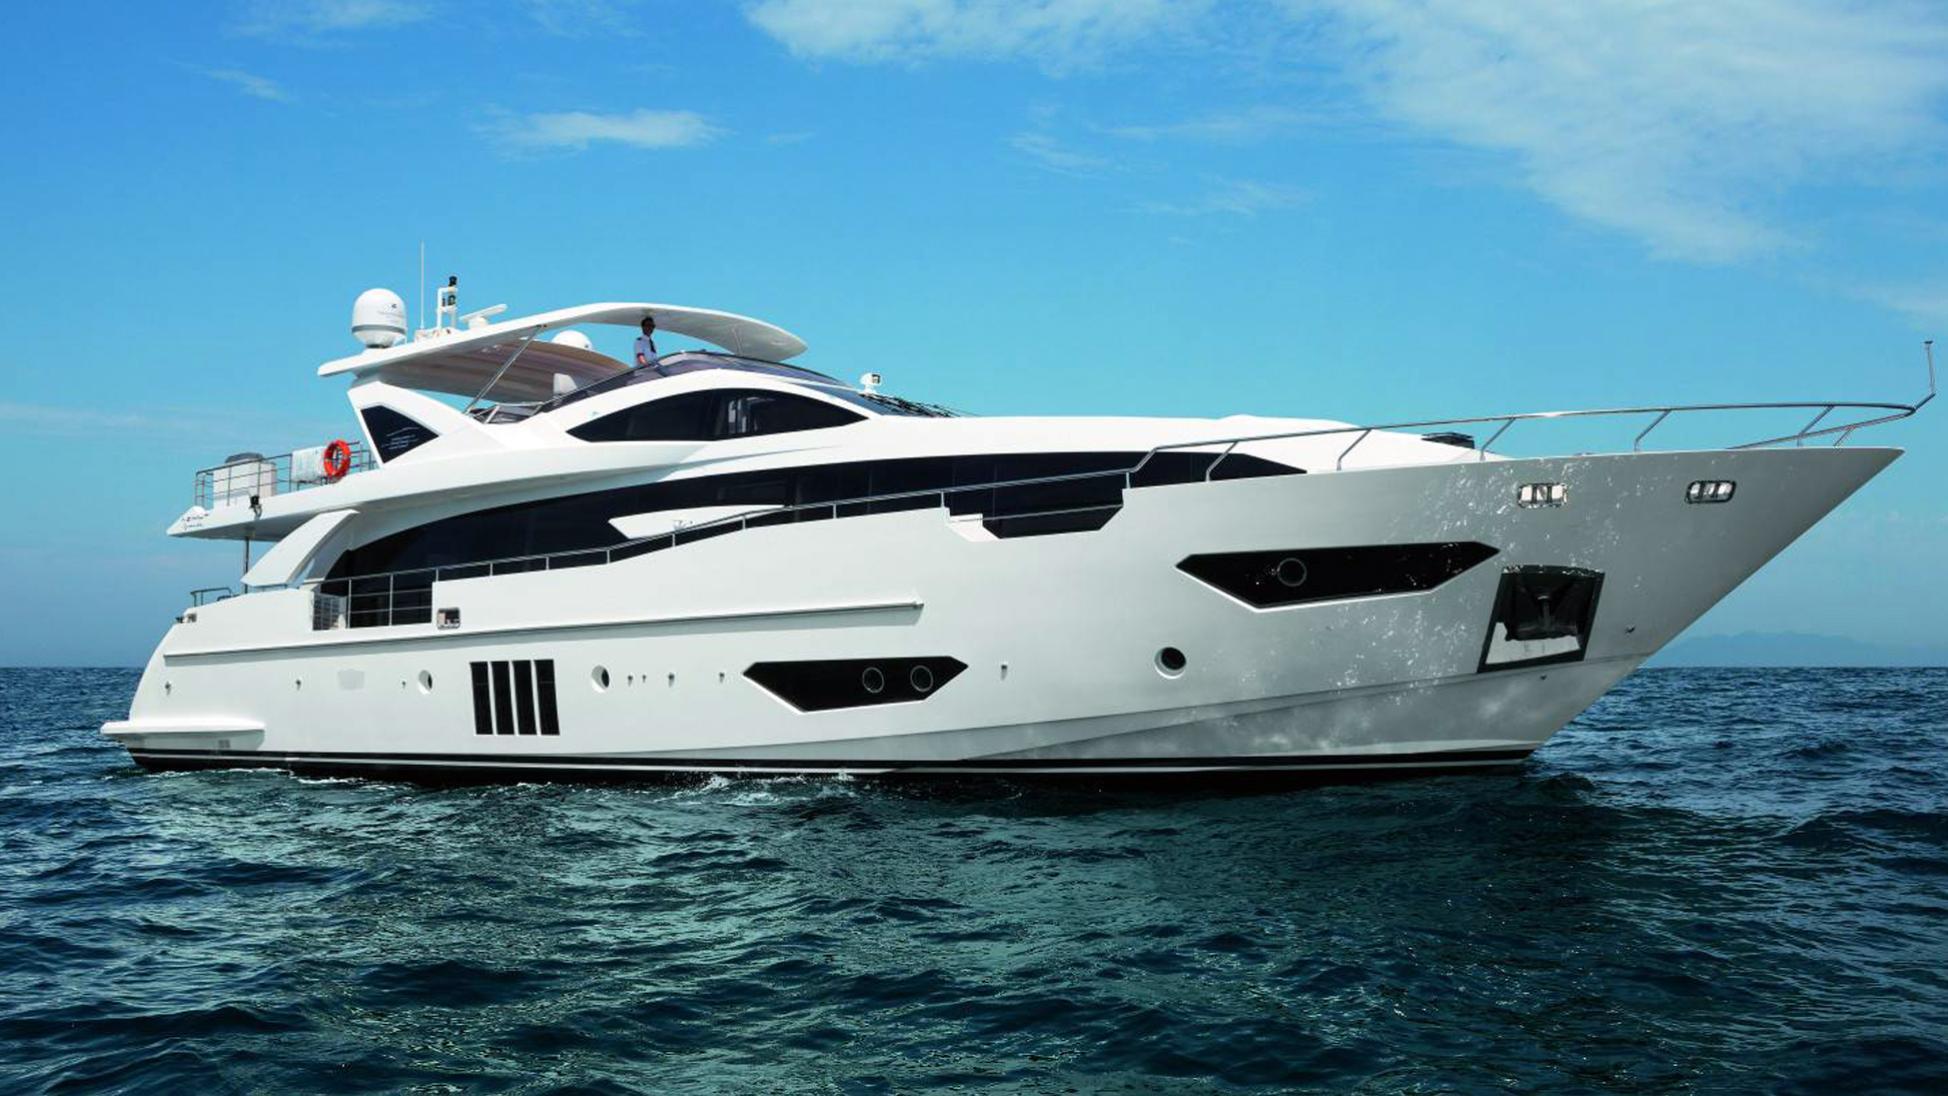 vicious-rumour-azimut-motoryacht-95-rph-21-2017-29m-profile-rendering